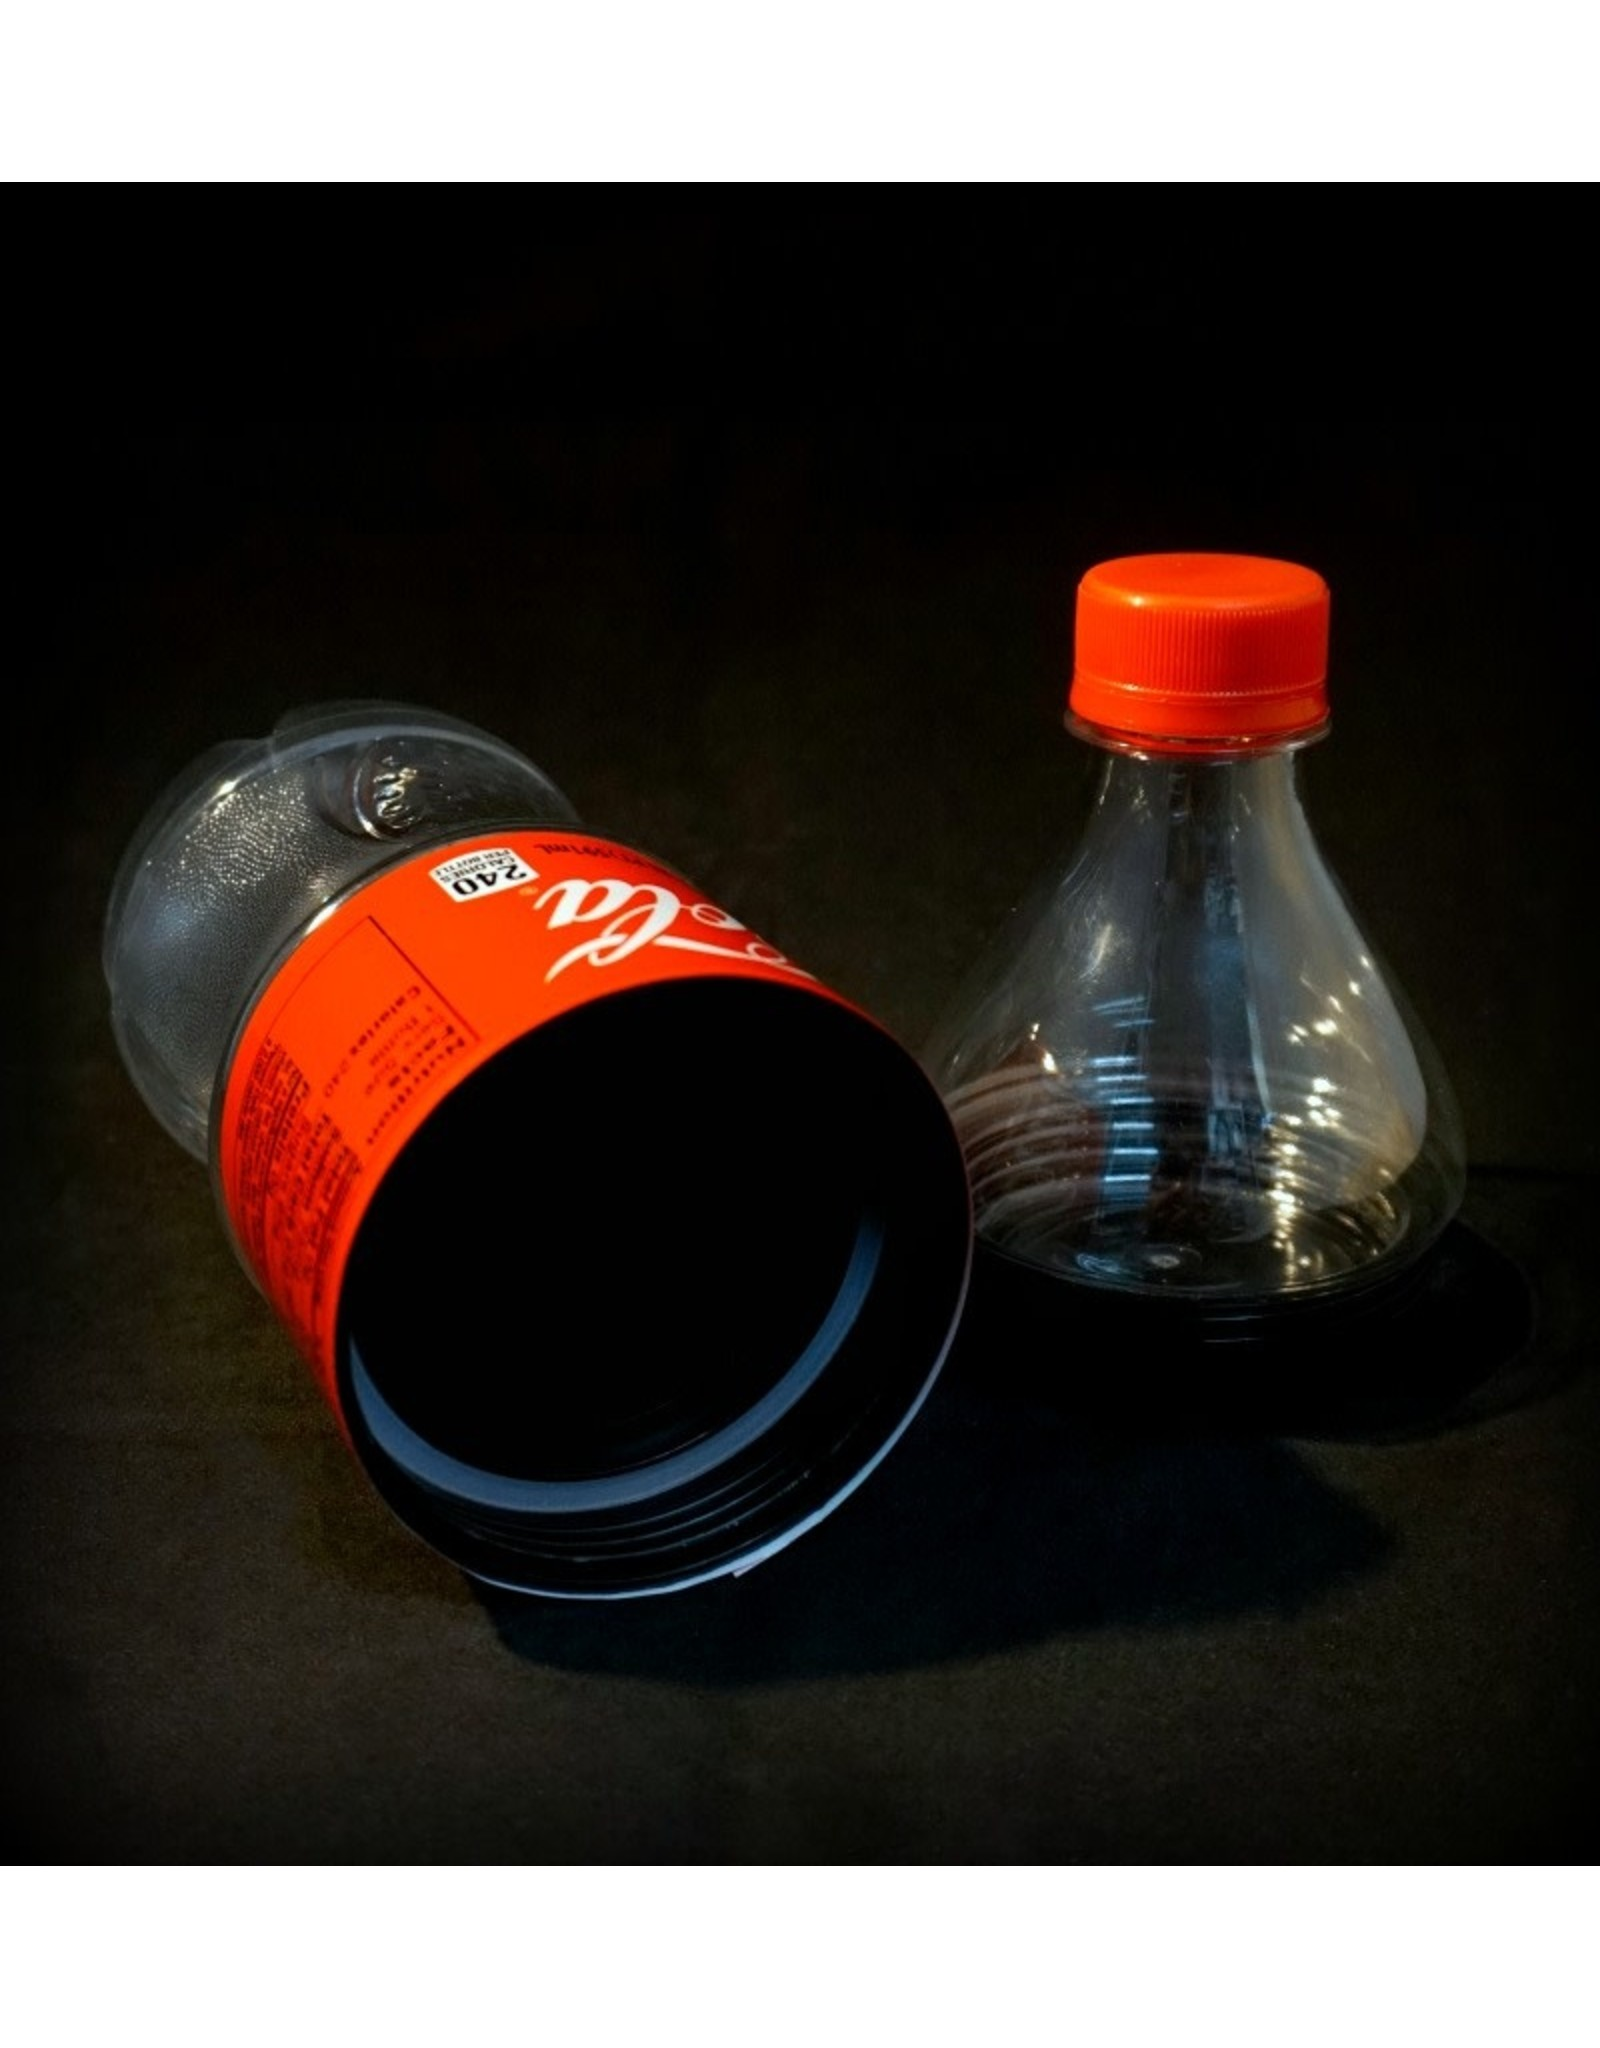 Coca Cola 20oz Bottle - Diversion Safe